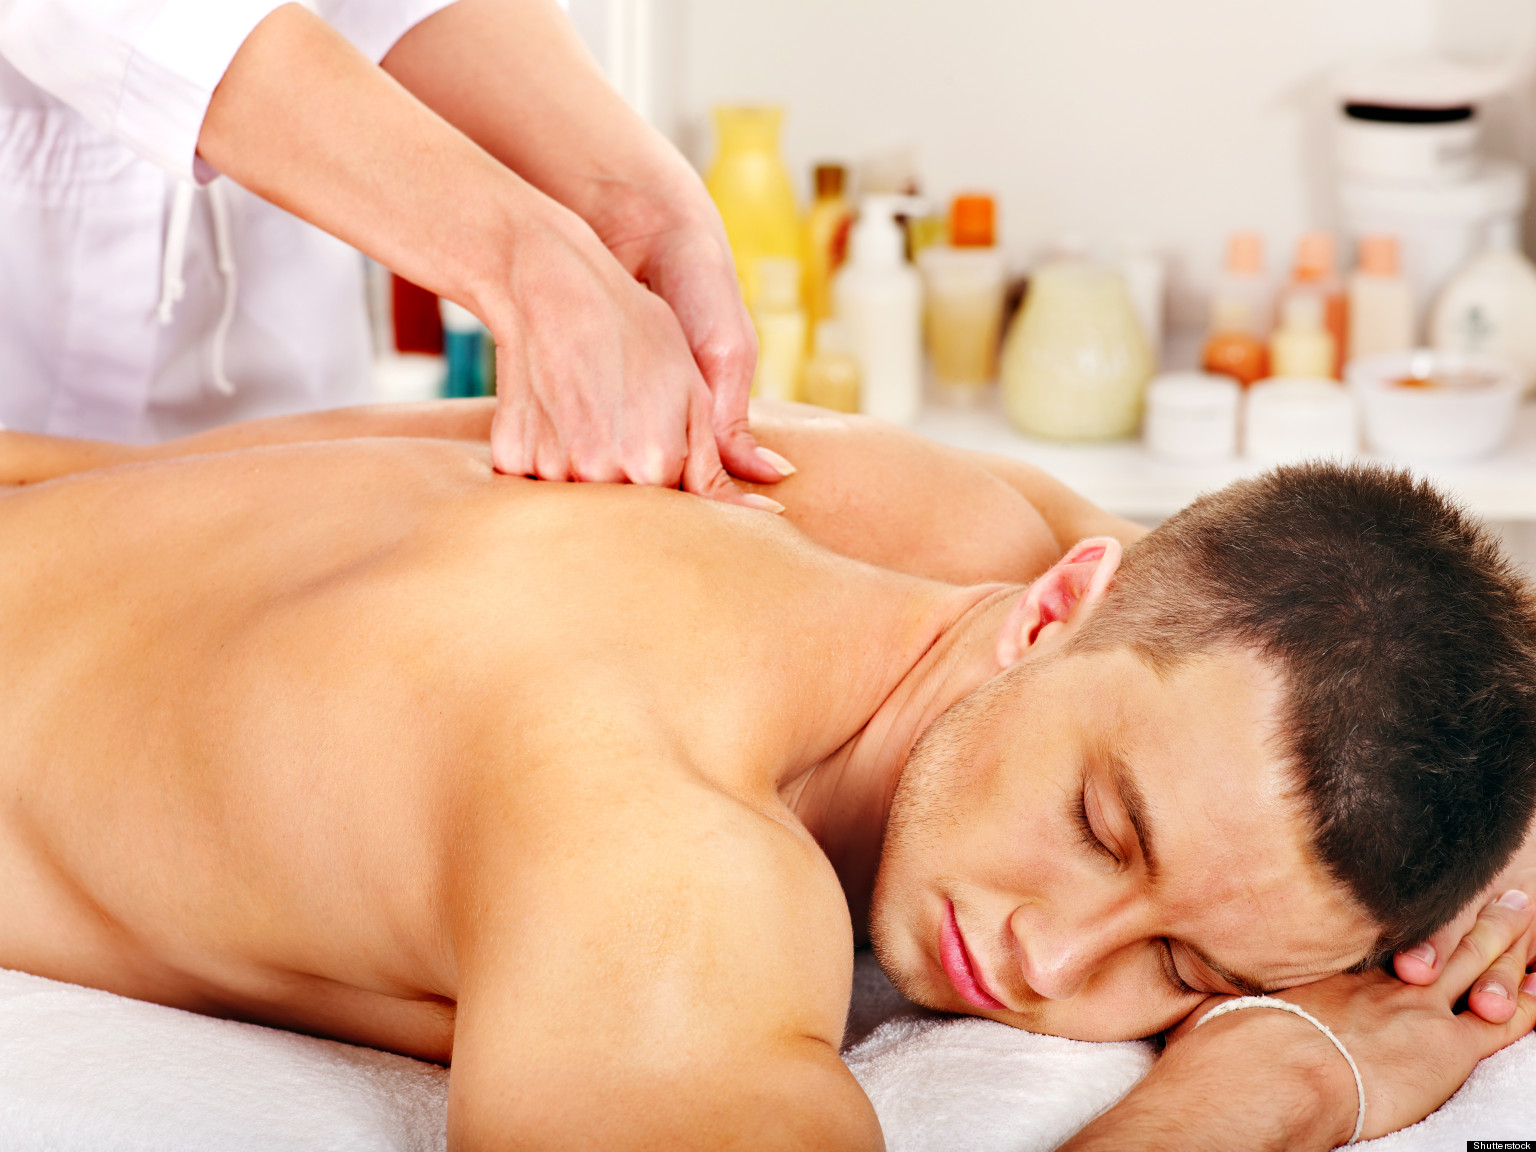 japanese massage wiki Huntington Beach, California